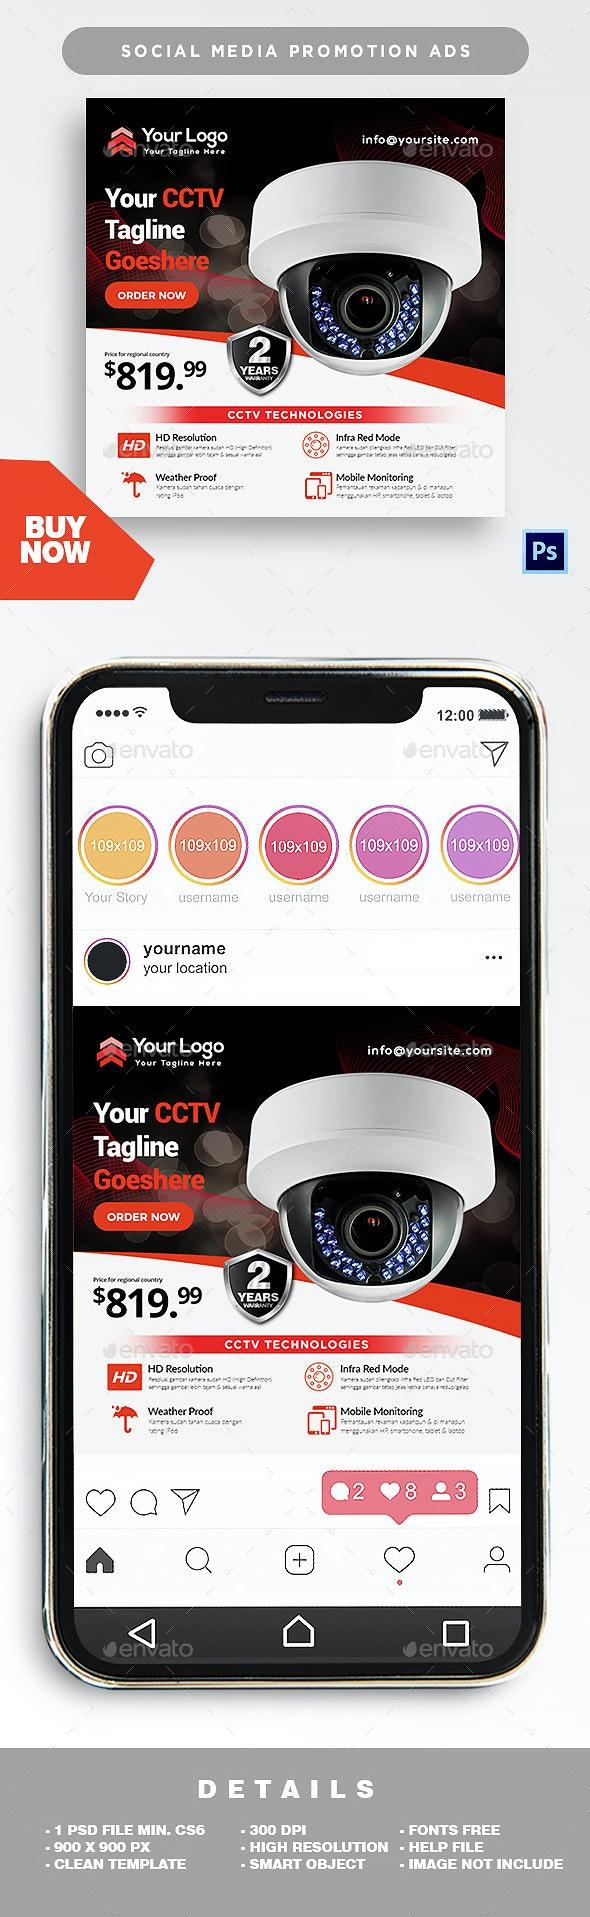 Social Media Ads - CCTV - Social Media Web Elements